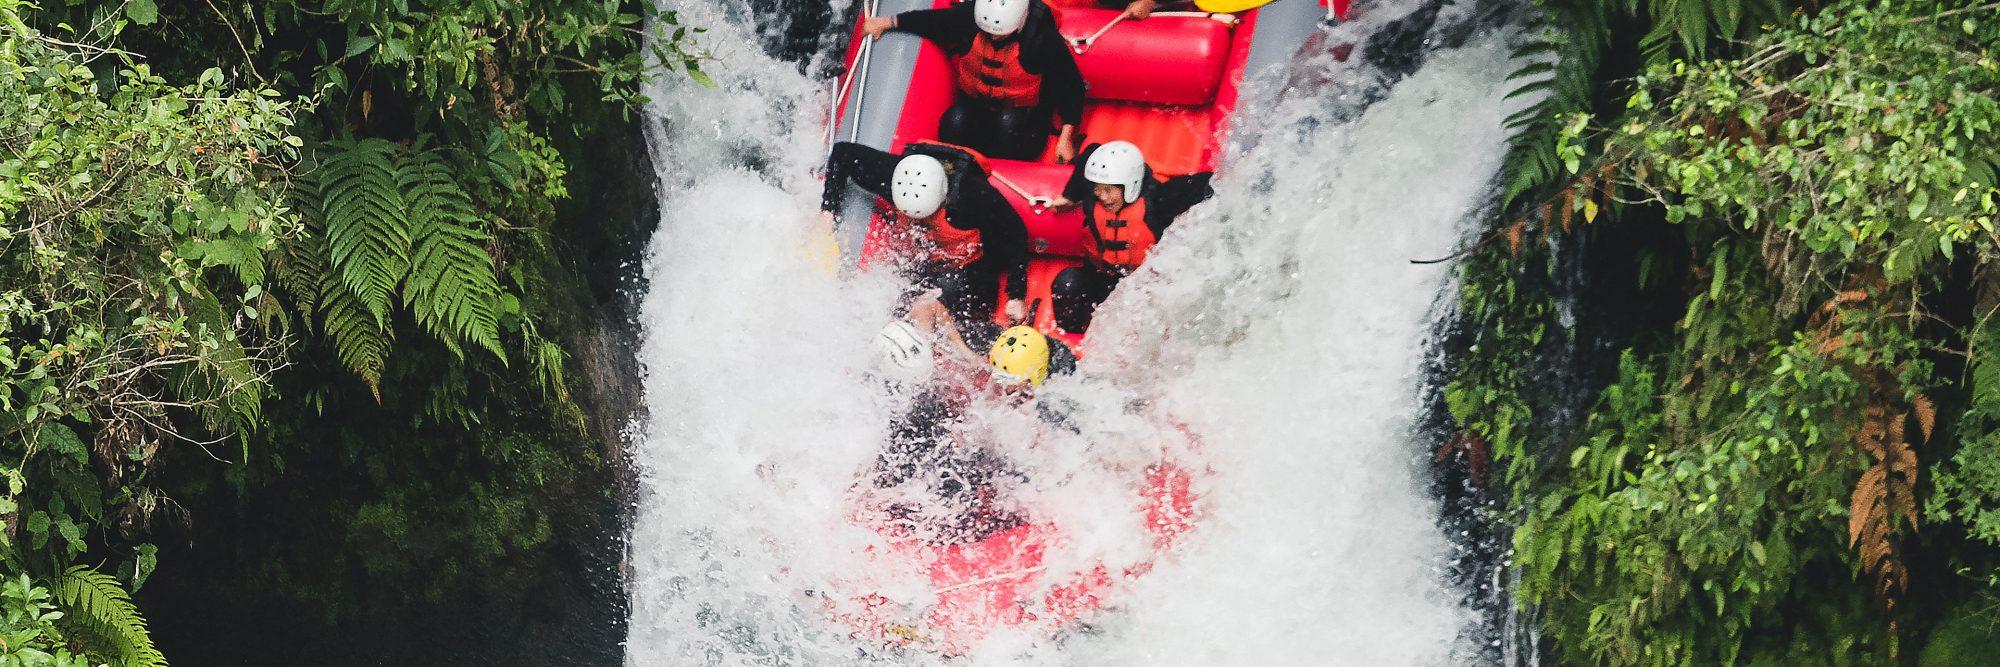 Rotorua White Water Rafting, New Zealand